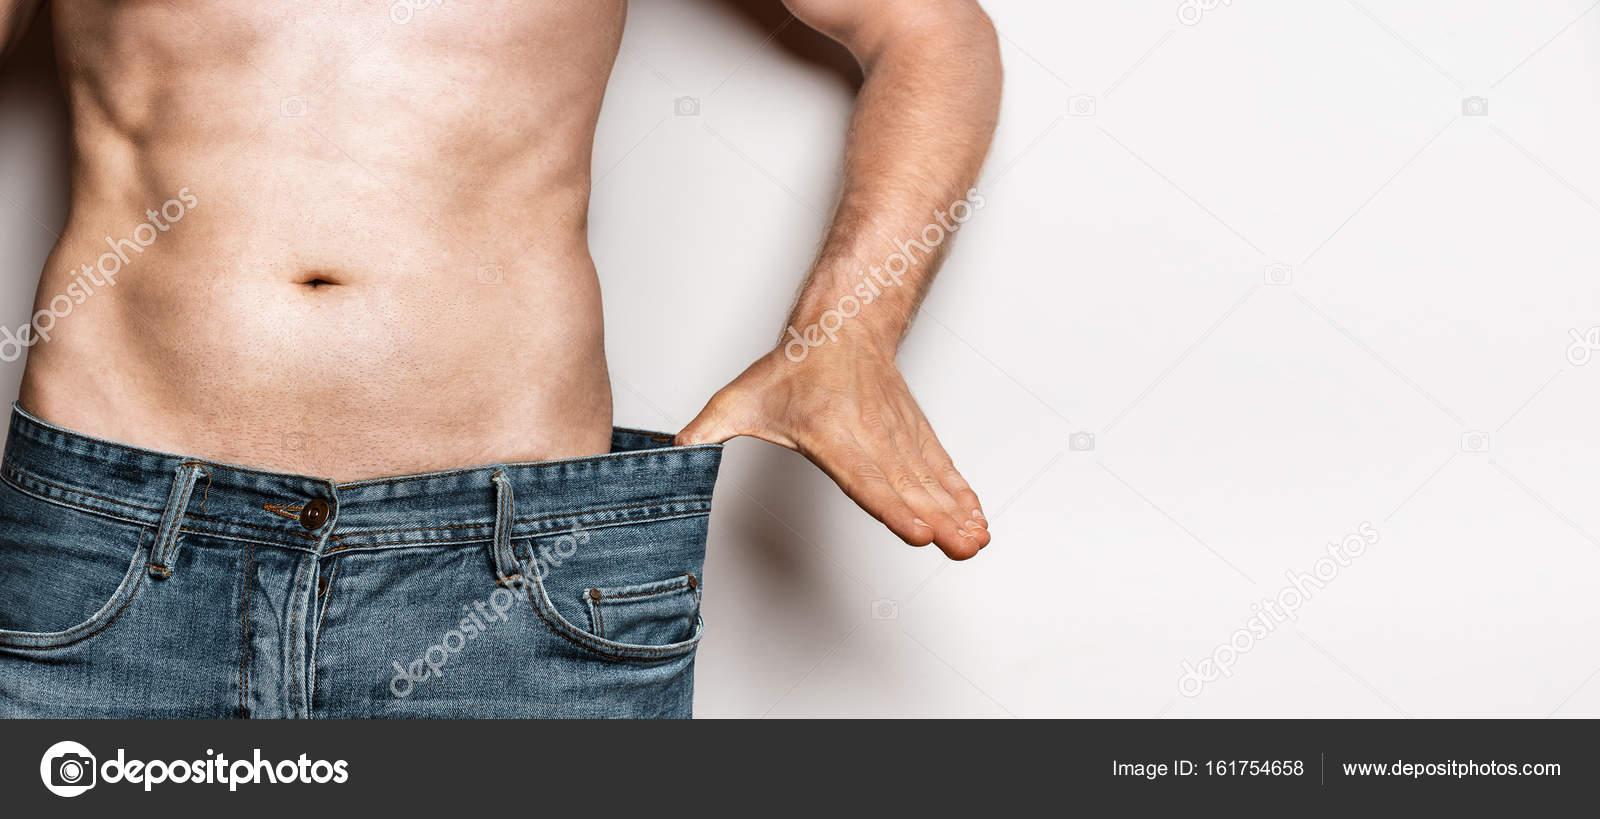 Diete Per Perdere Peso Uomo : Dieta per dimagrire kg in un mese gratis